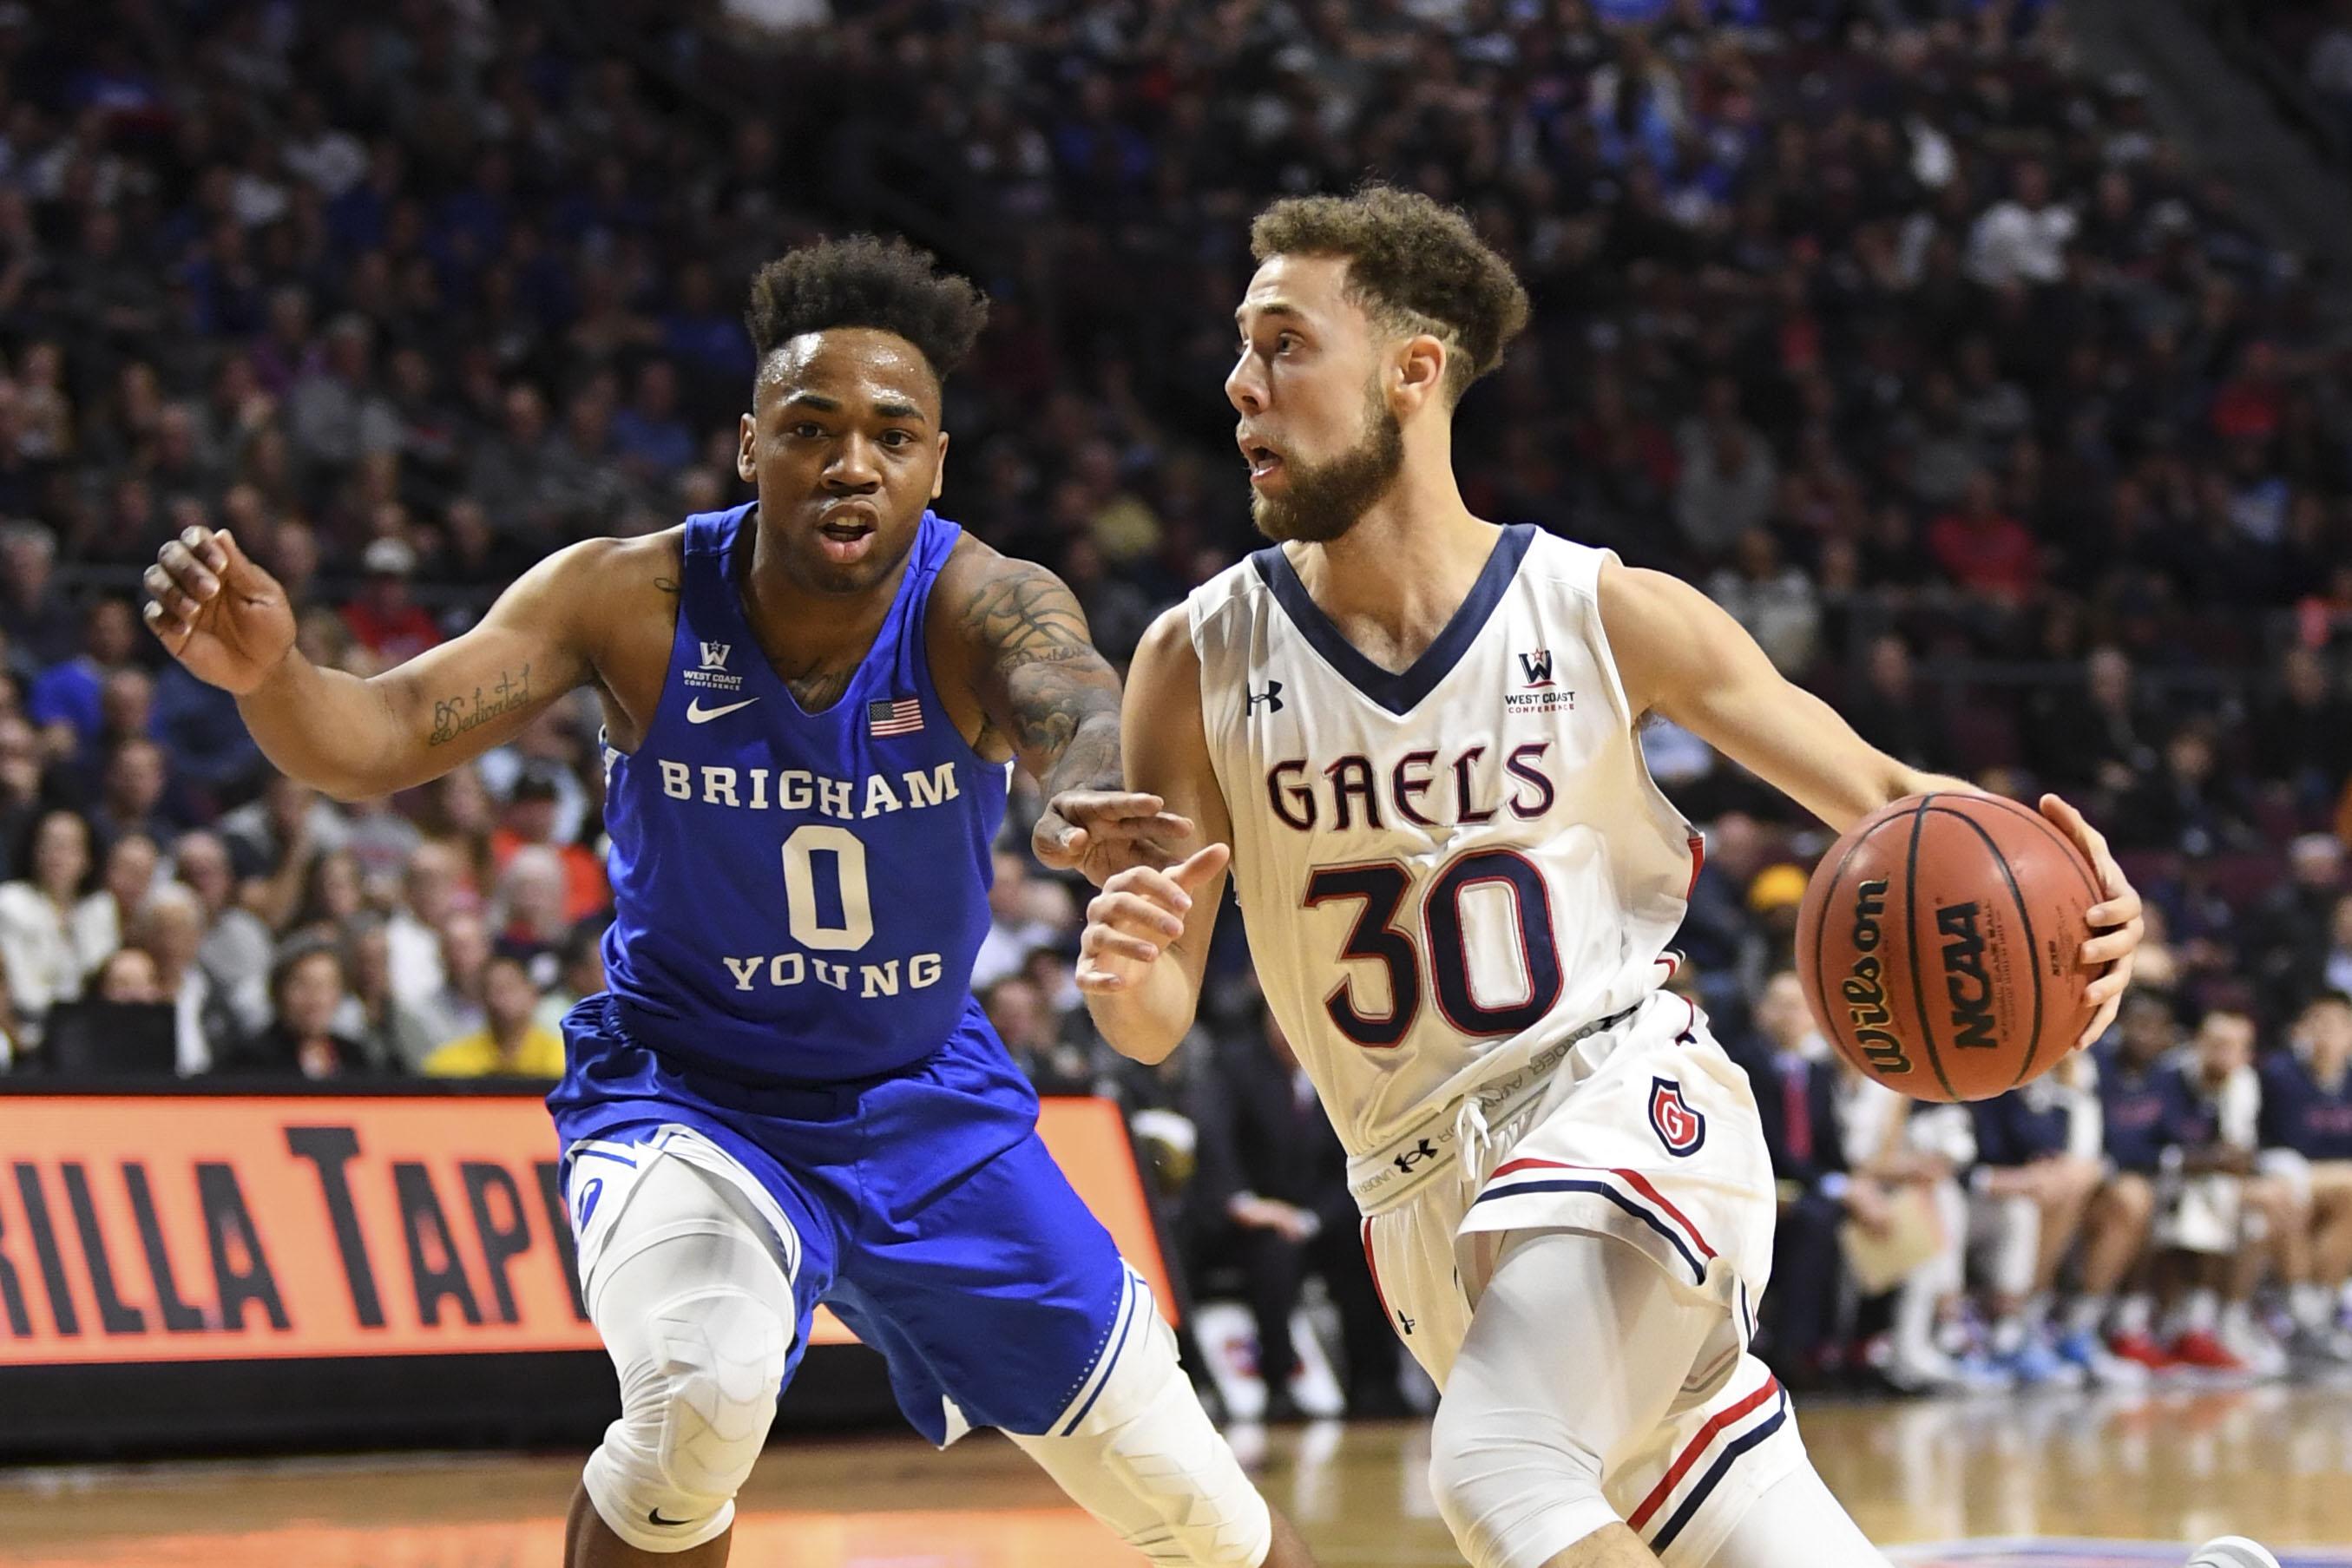 NCAA Basketball: West Coast Conference Tournament-Saint Mary's vs BYU